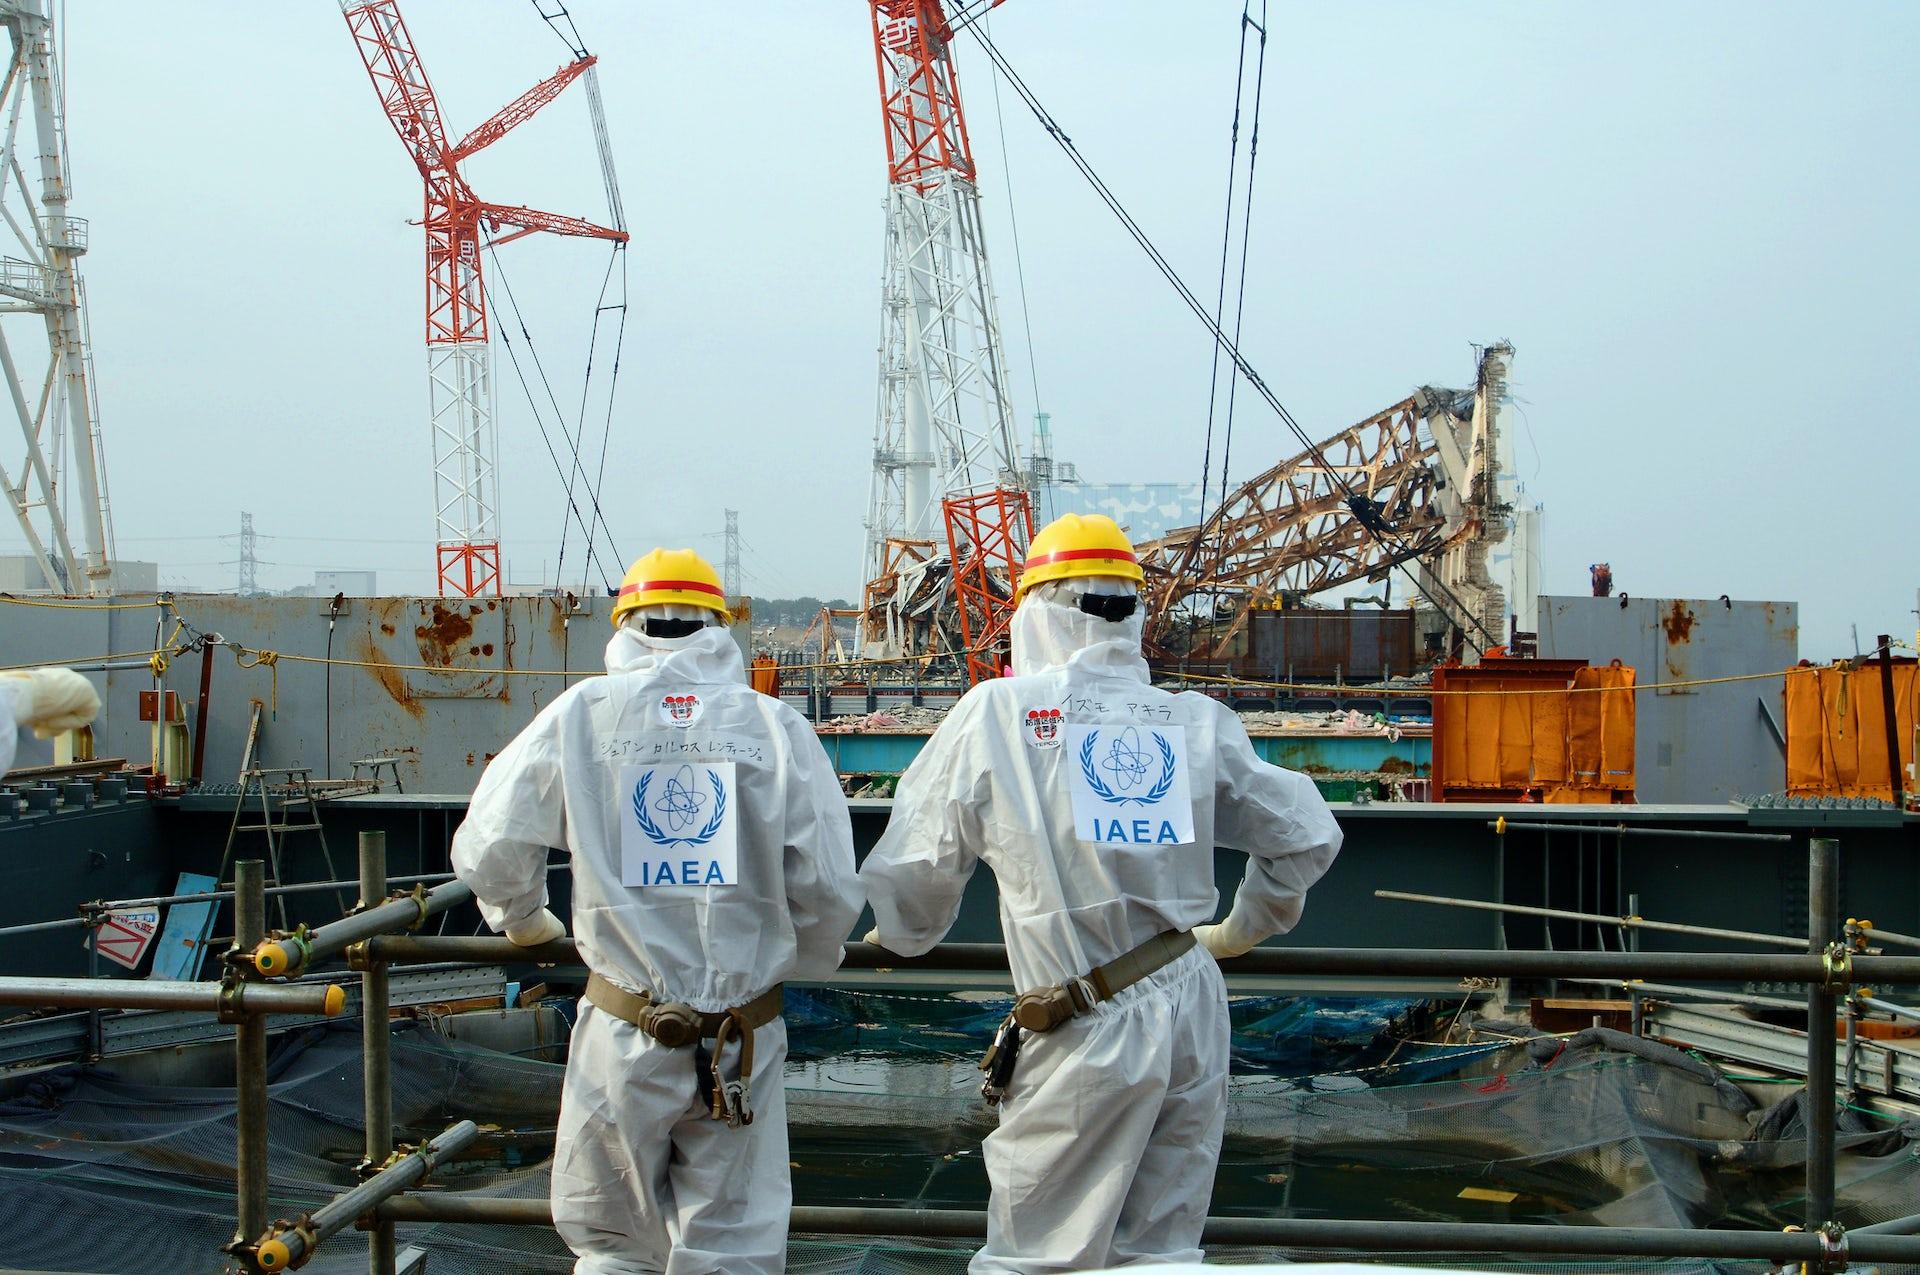 Two IAEA agents examine work Unit 4 of the Fukushima Daiichi Nuclear Power Station (April 17, 2013).Greg Webb/IAEA, CC BY